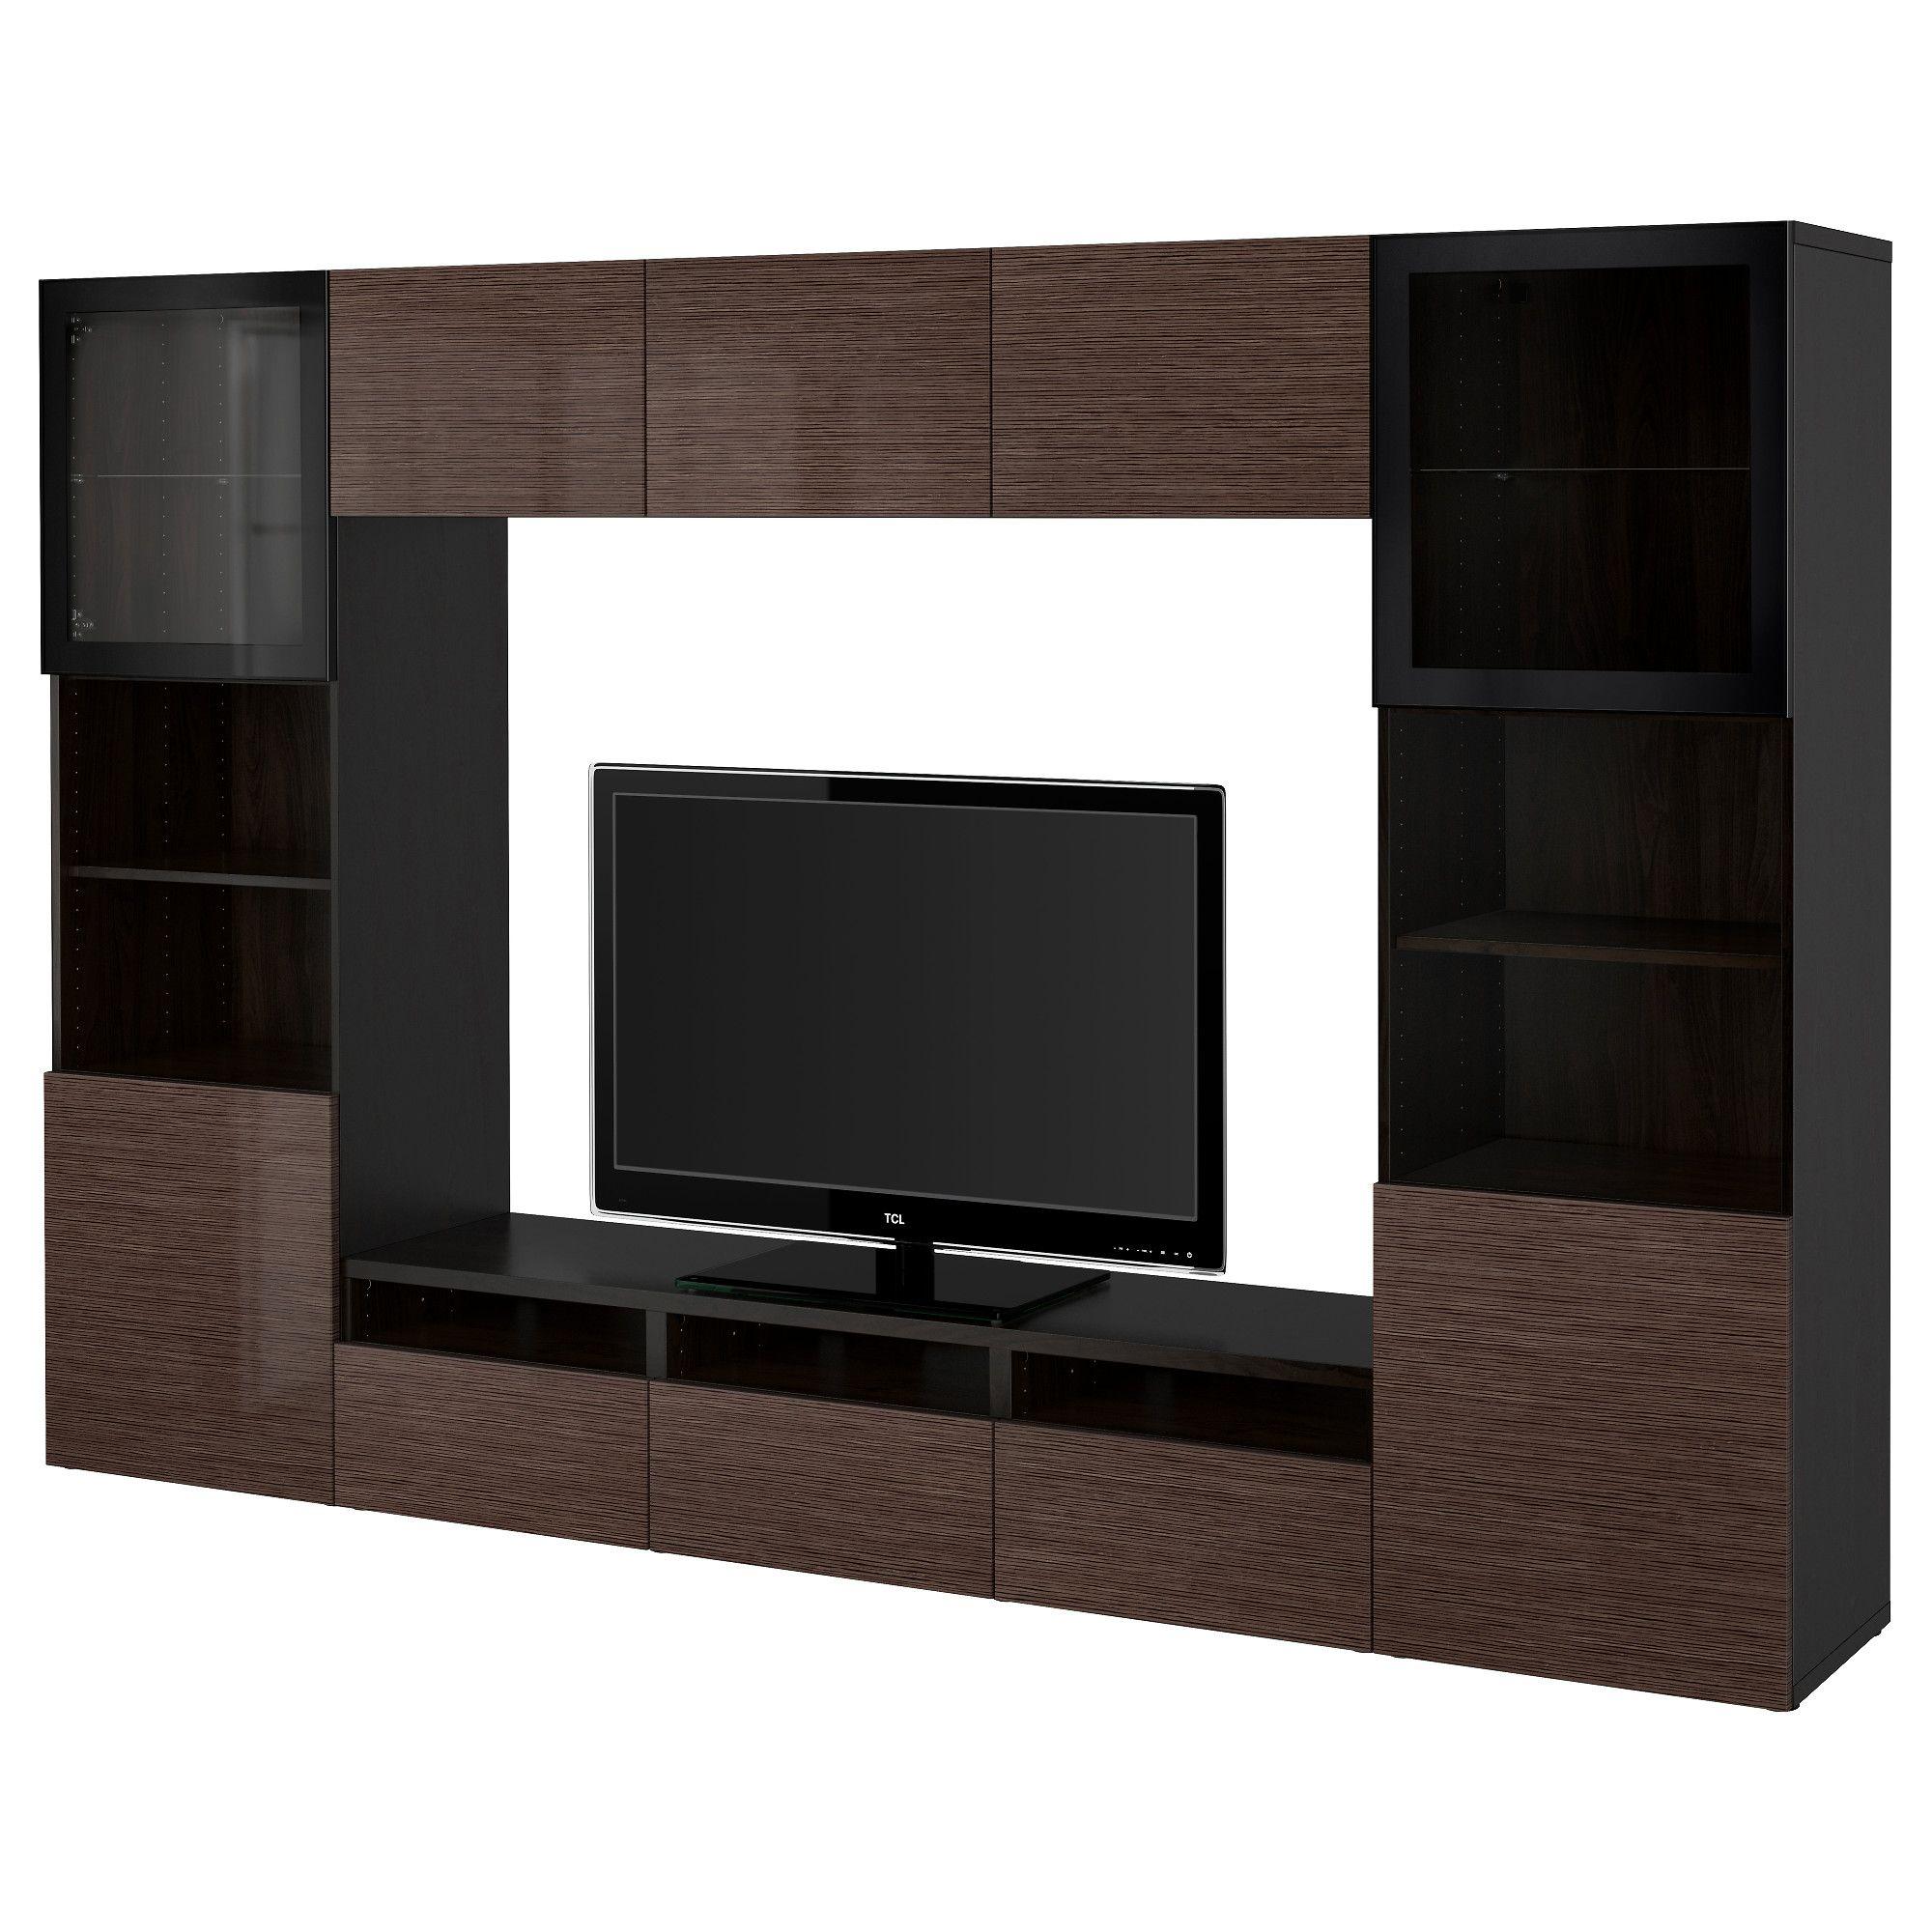 Neu Tv Wohnwand Selber Bauen Design